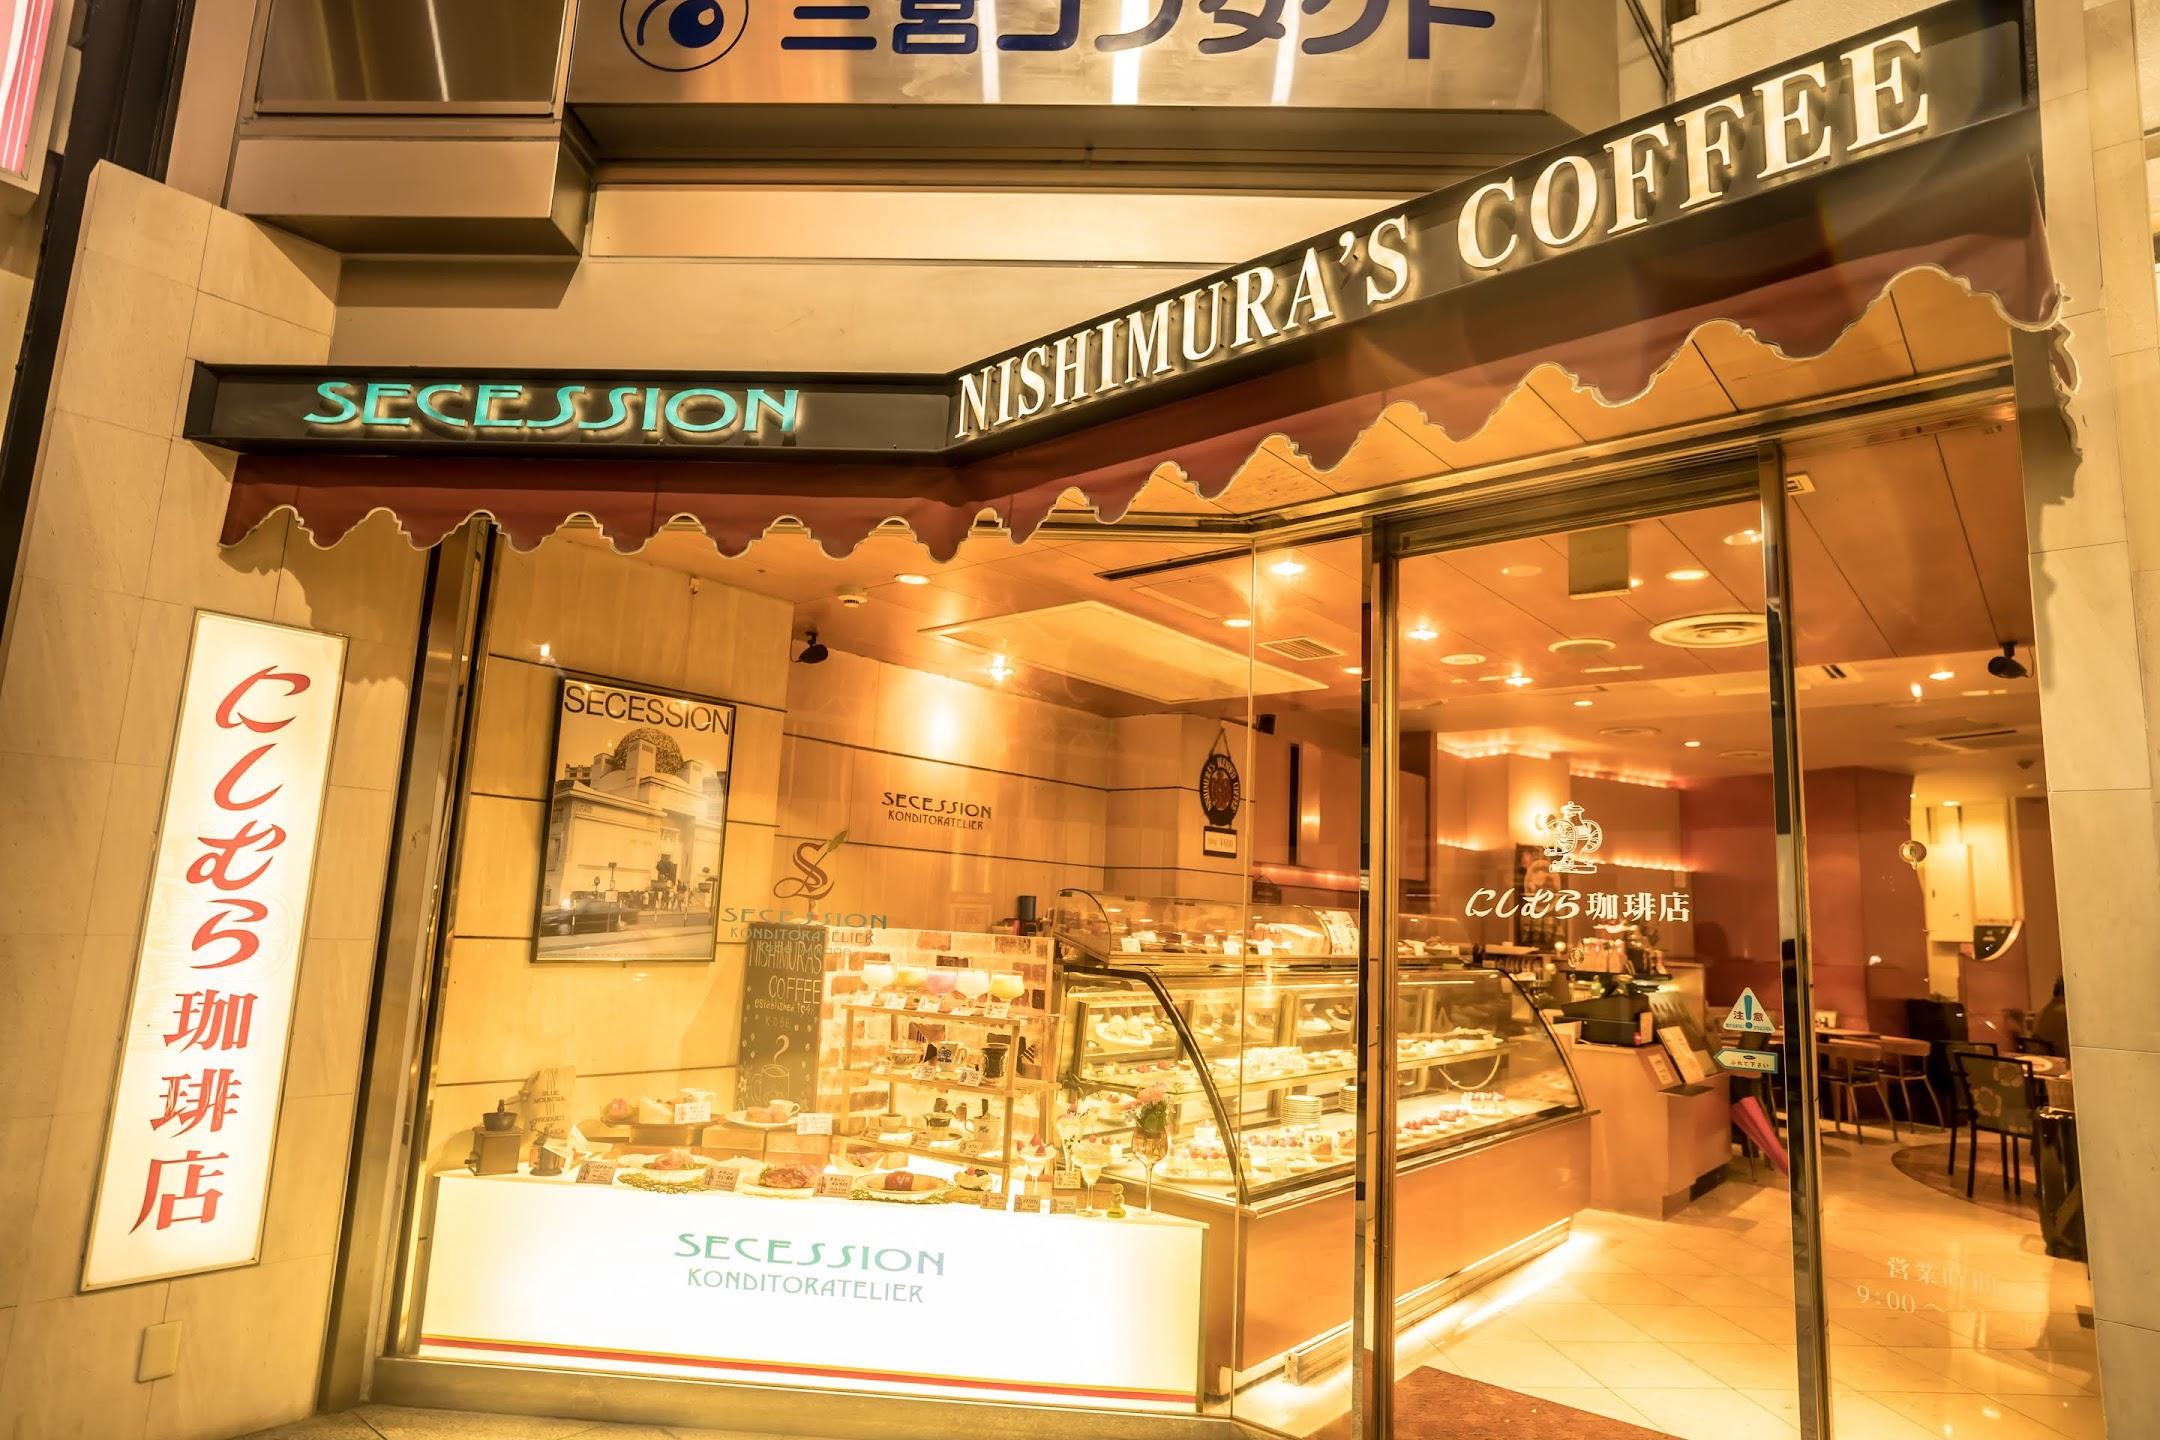 Kobe Nishimura's Coffee1